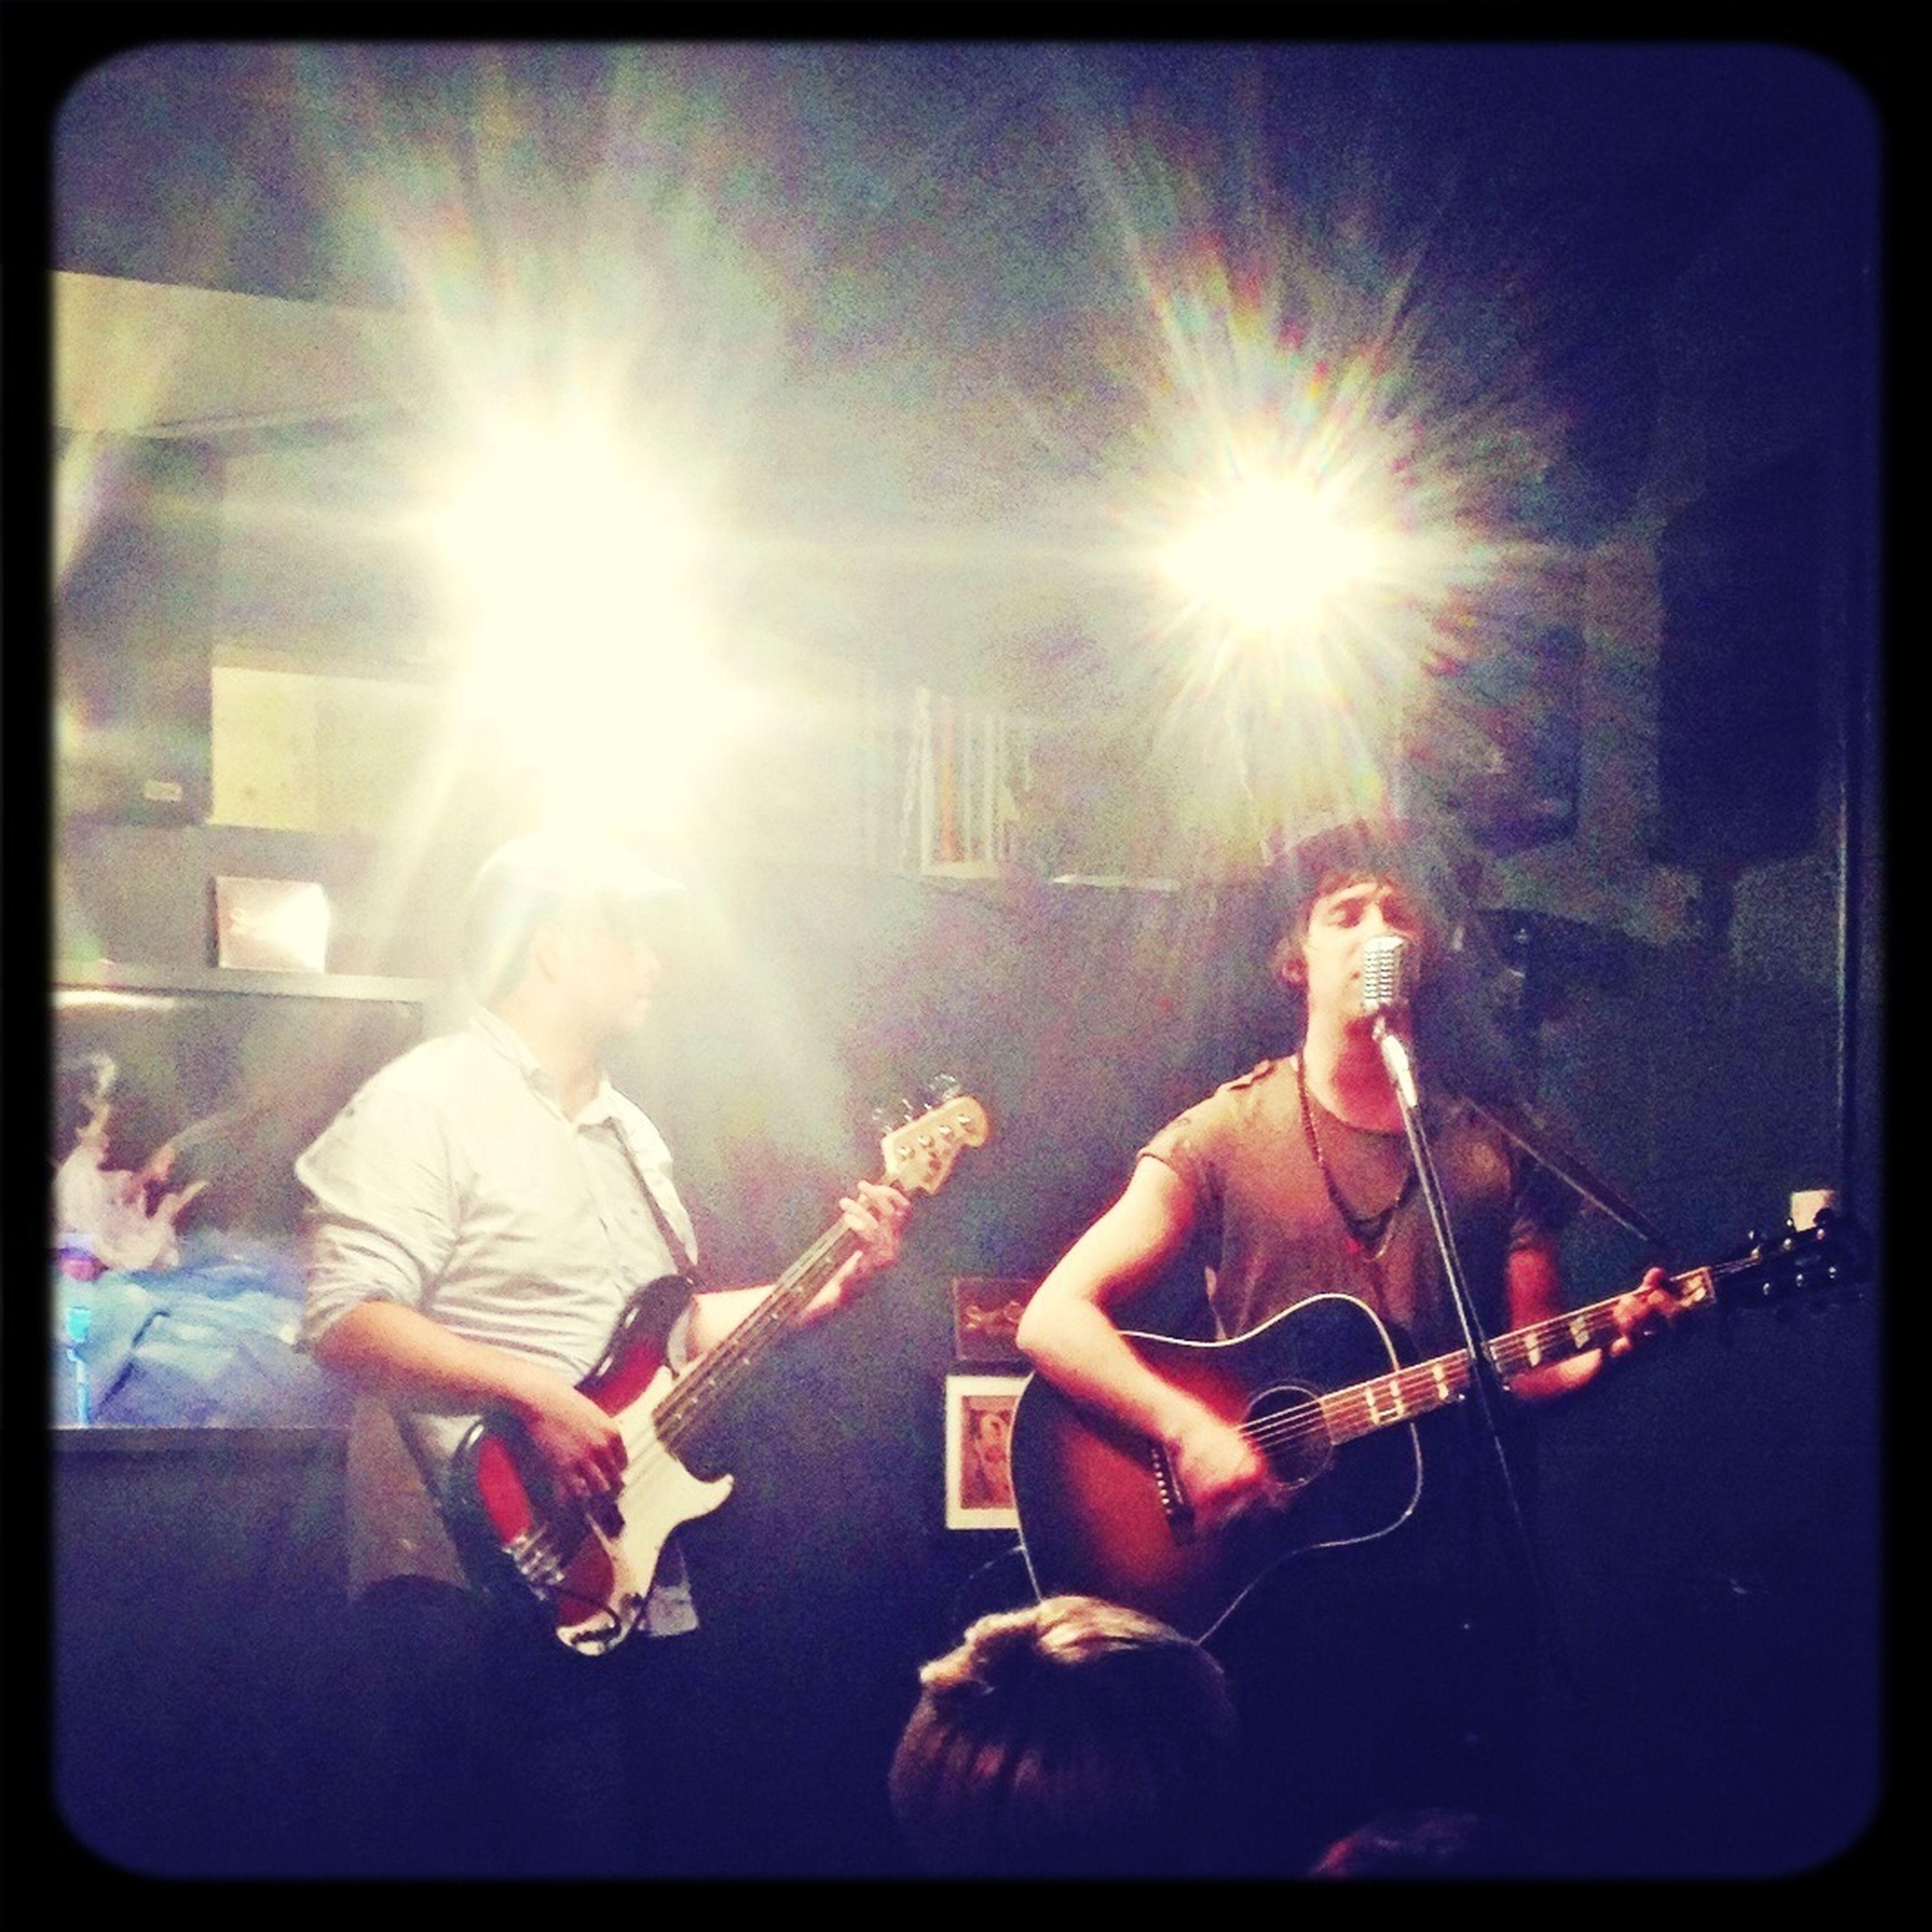 SuperCaine @ Room 60 Bar. Brisbane, September 2013. music makes Music Makes Me Lose Contol